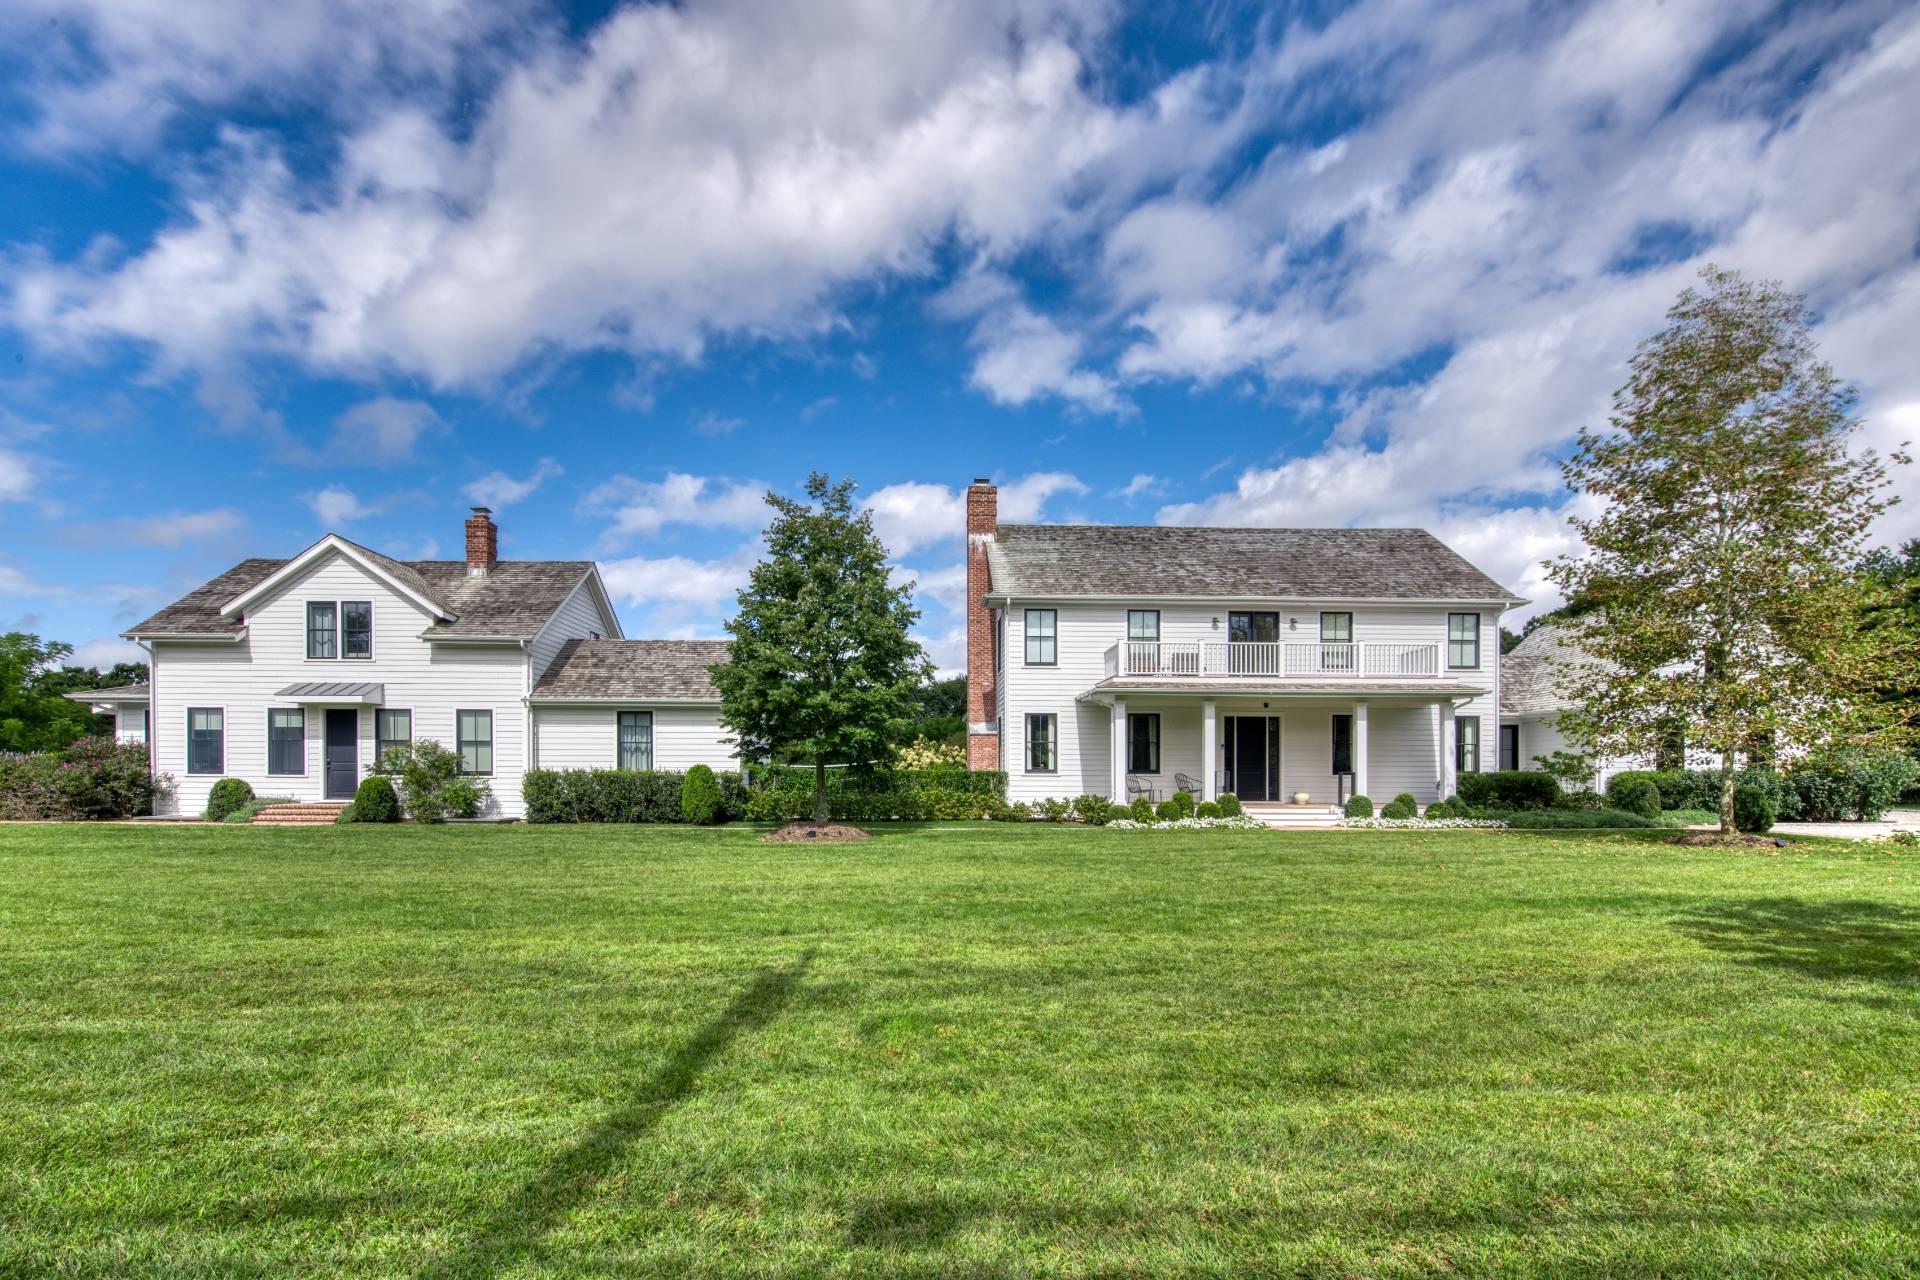 172 NARROW LANE EAST -COMPOUND - Main House and Co